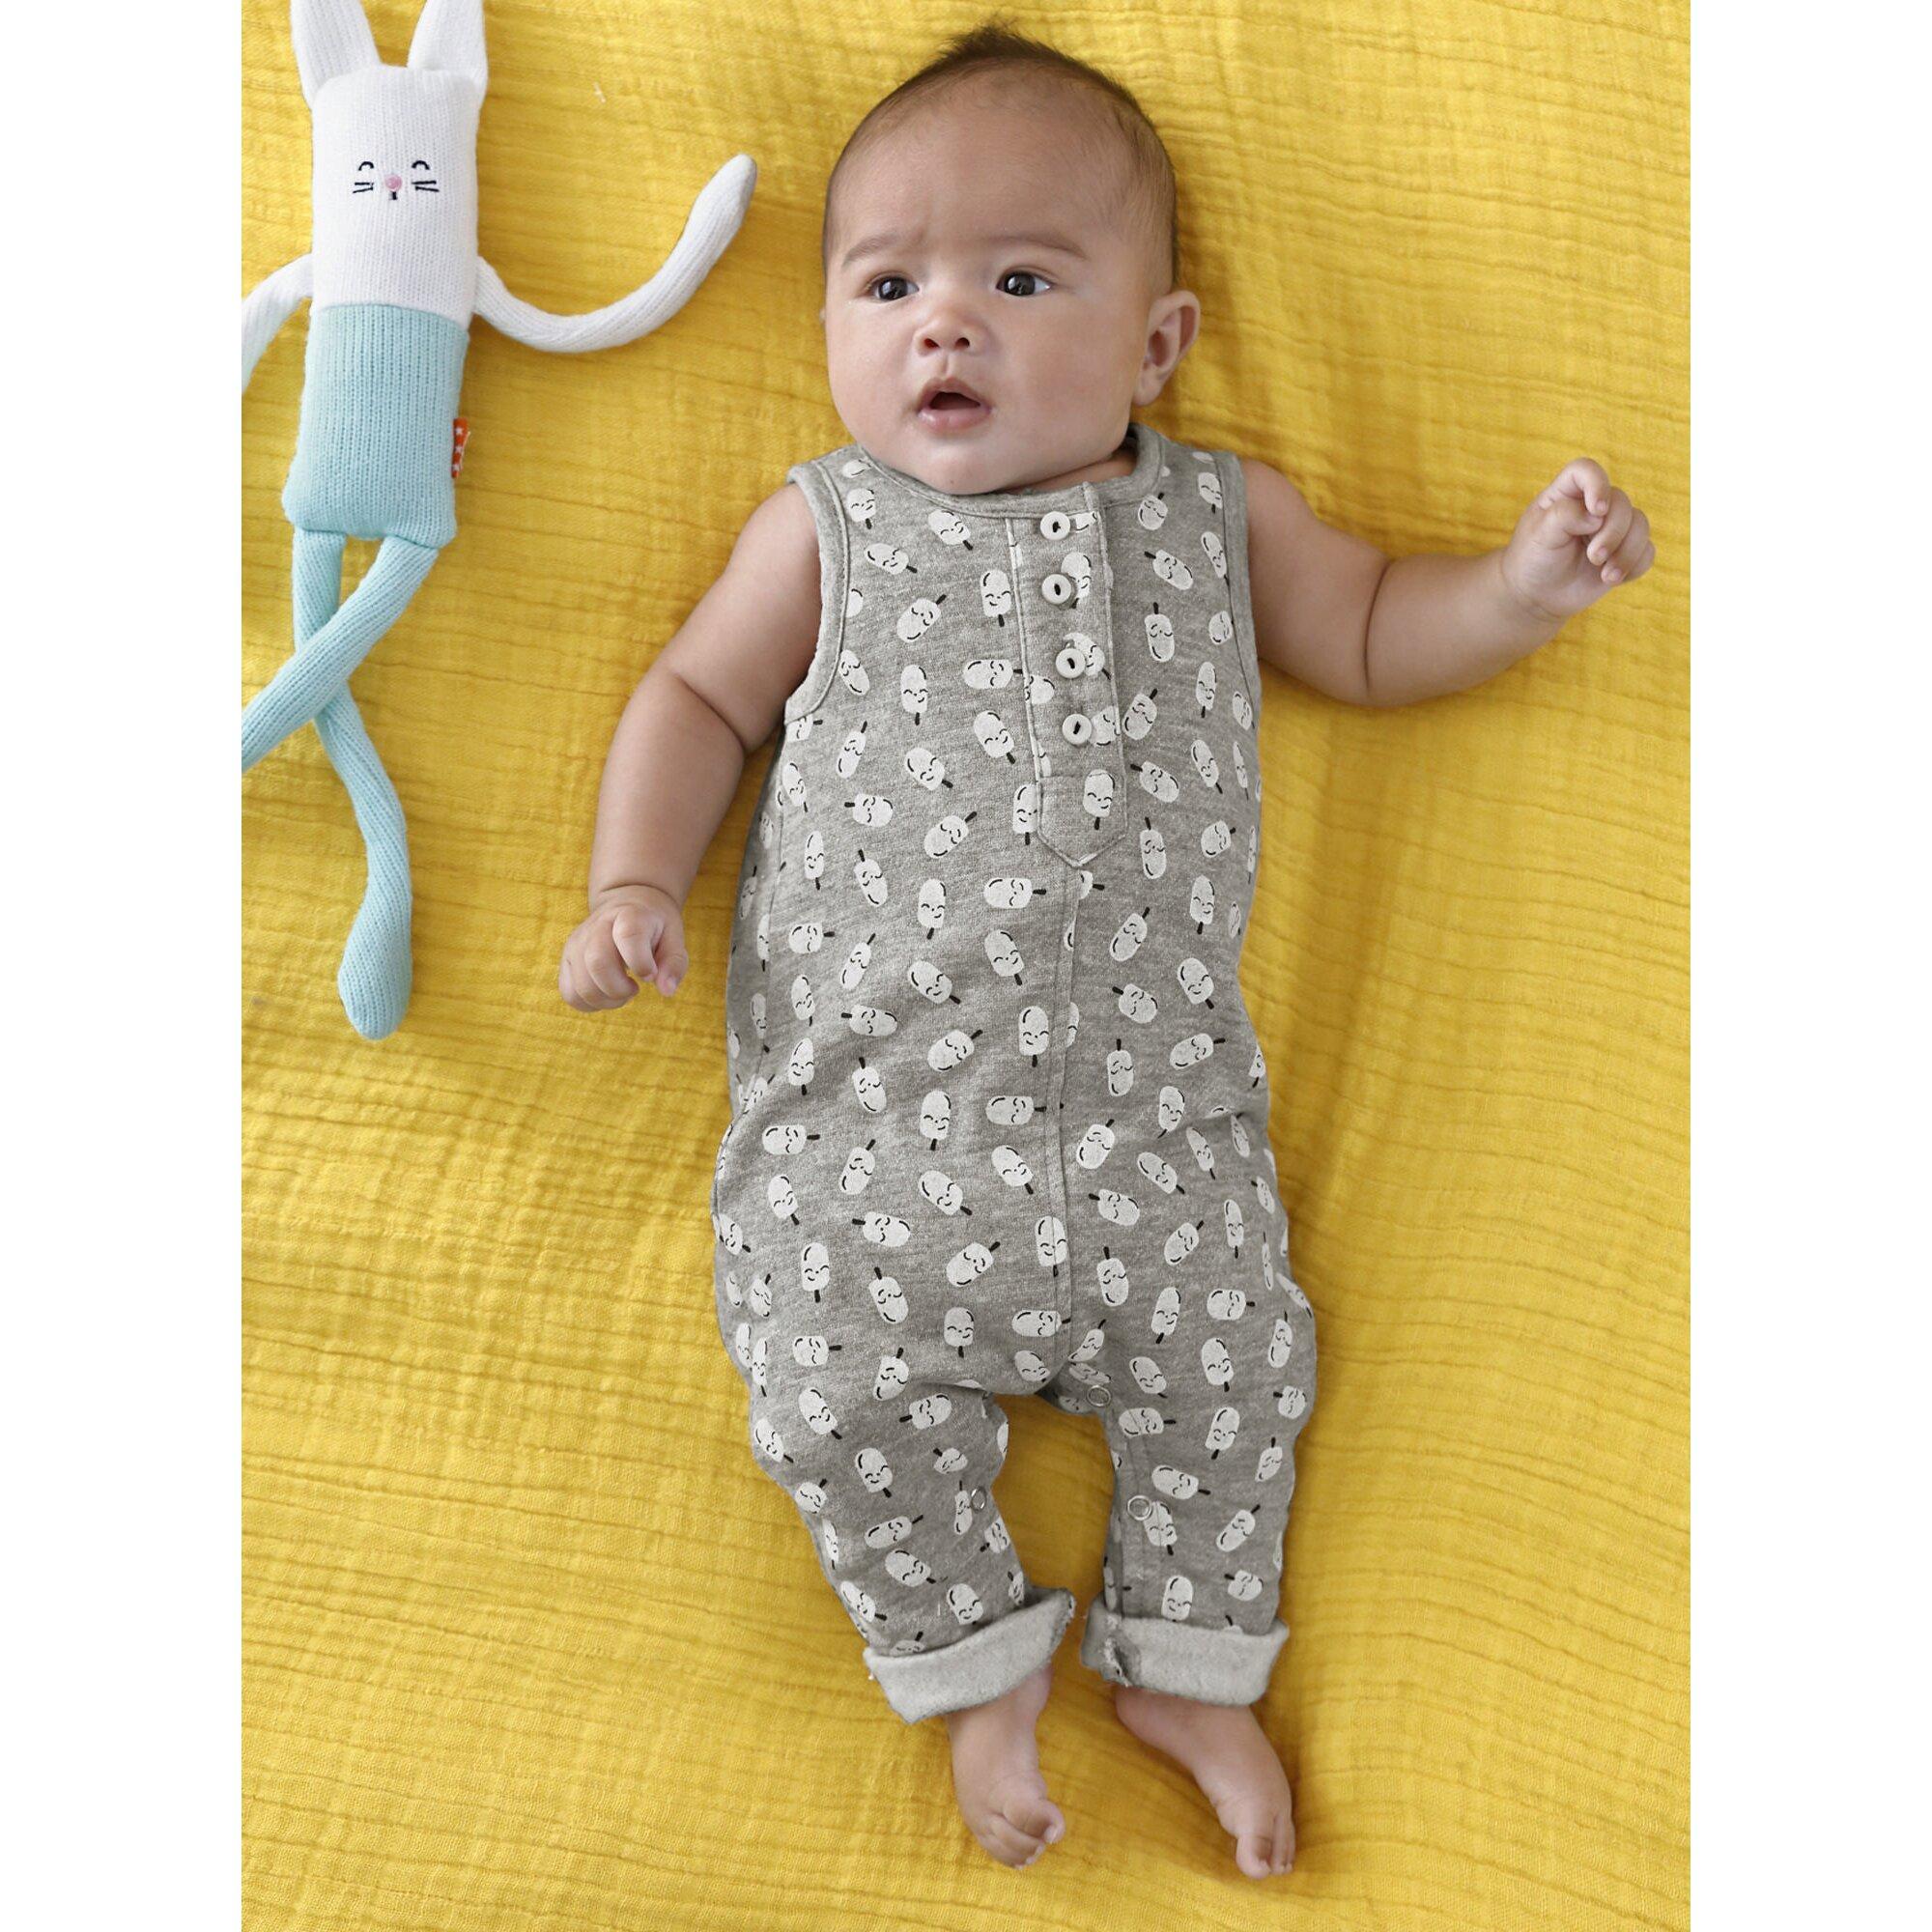 vertbaudet-baby-sommer-overall-eis, 13.99 EUR @ babywalz-de